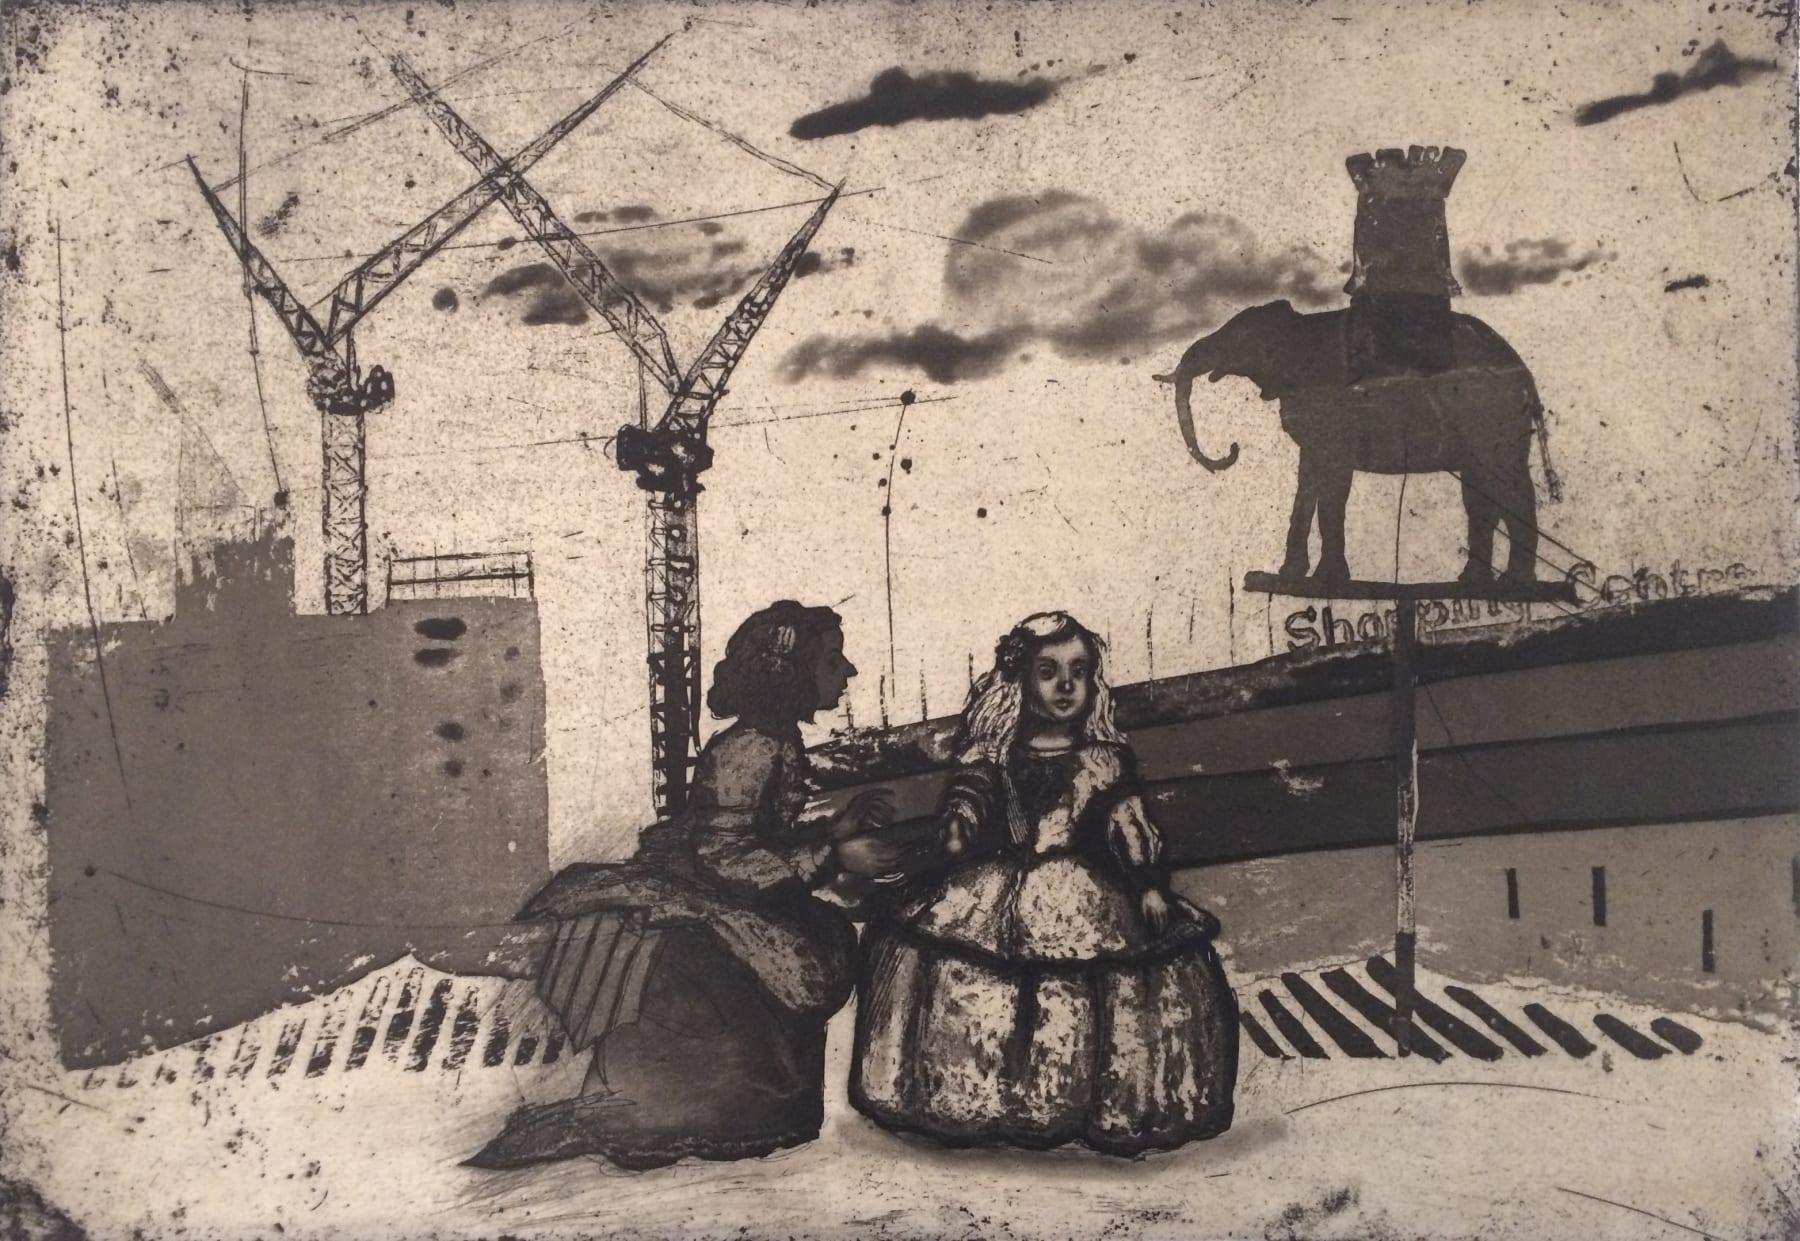 Mychael Barratt, Urban Myths VI - Infanta de Castilla at Elephant and Castle